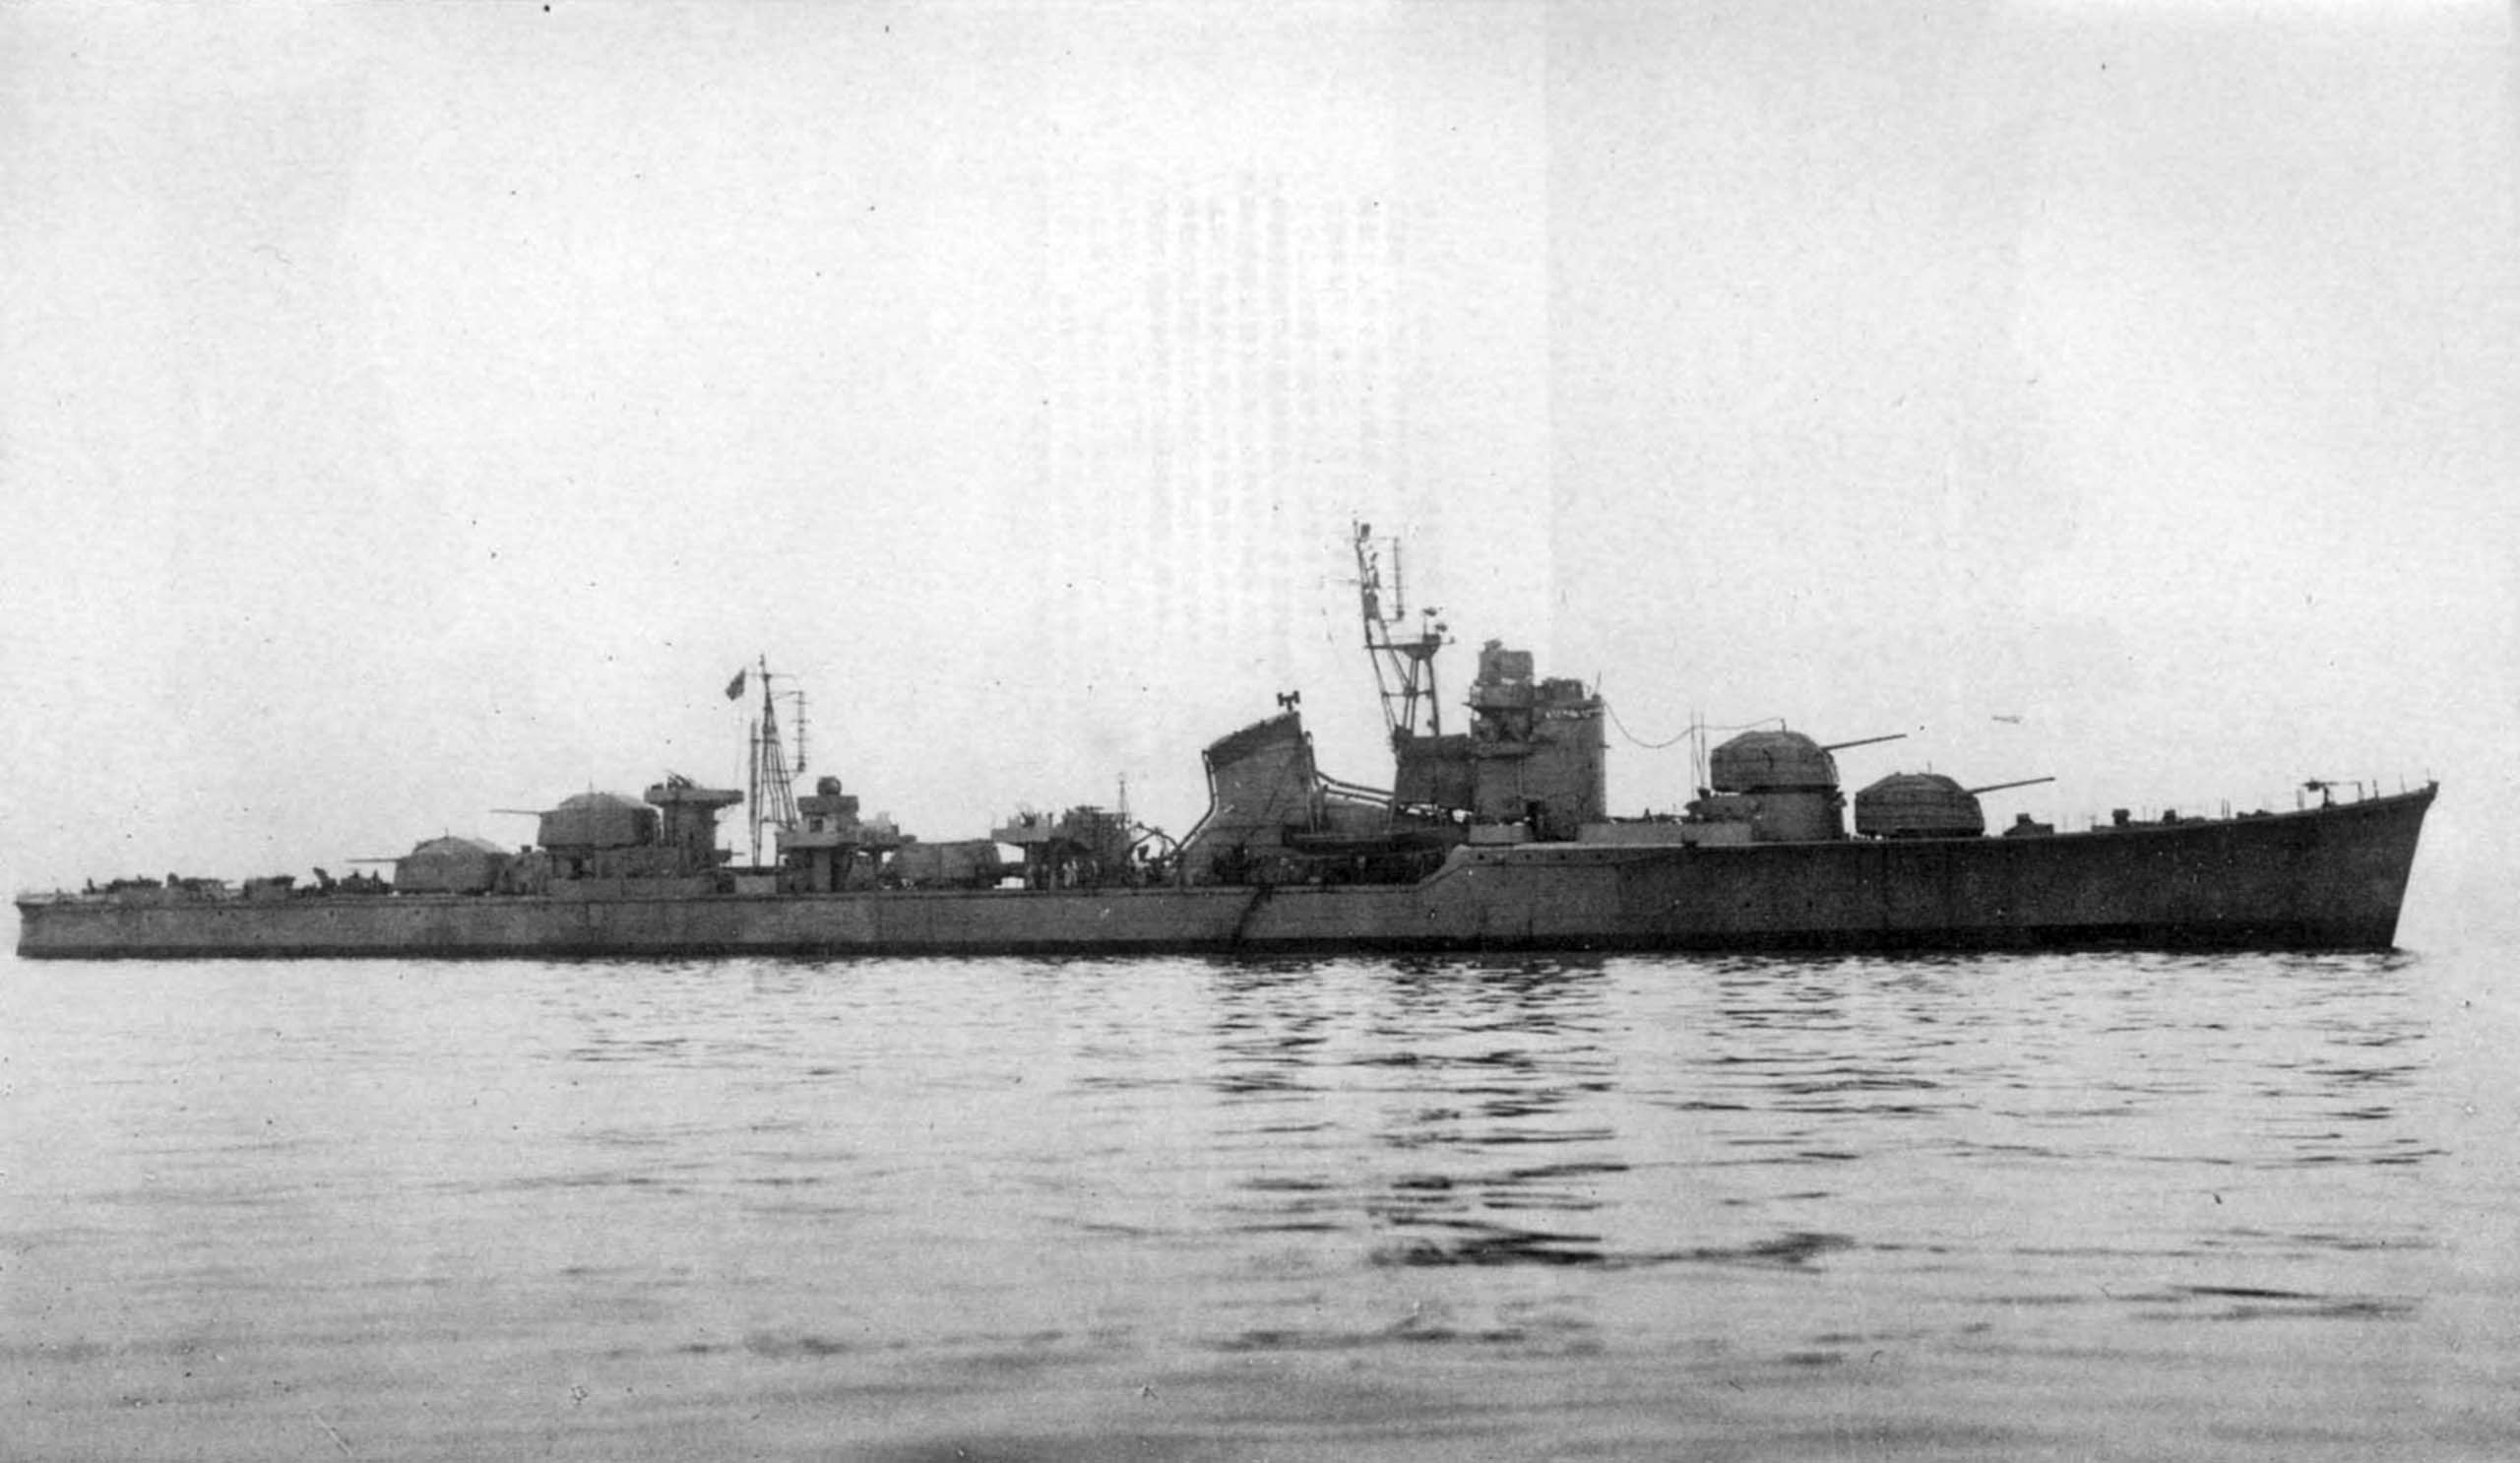 Japanese destroyer Harutsuki